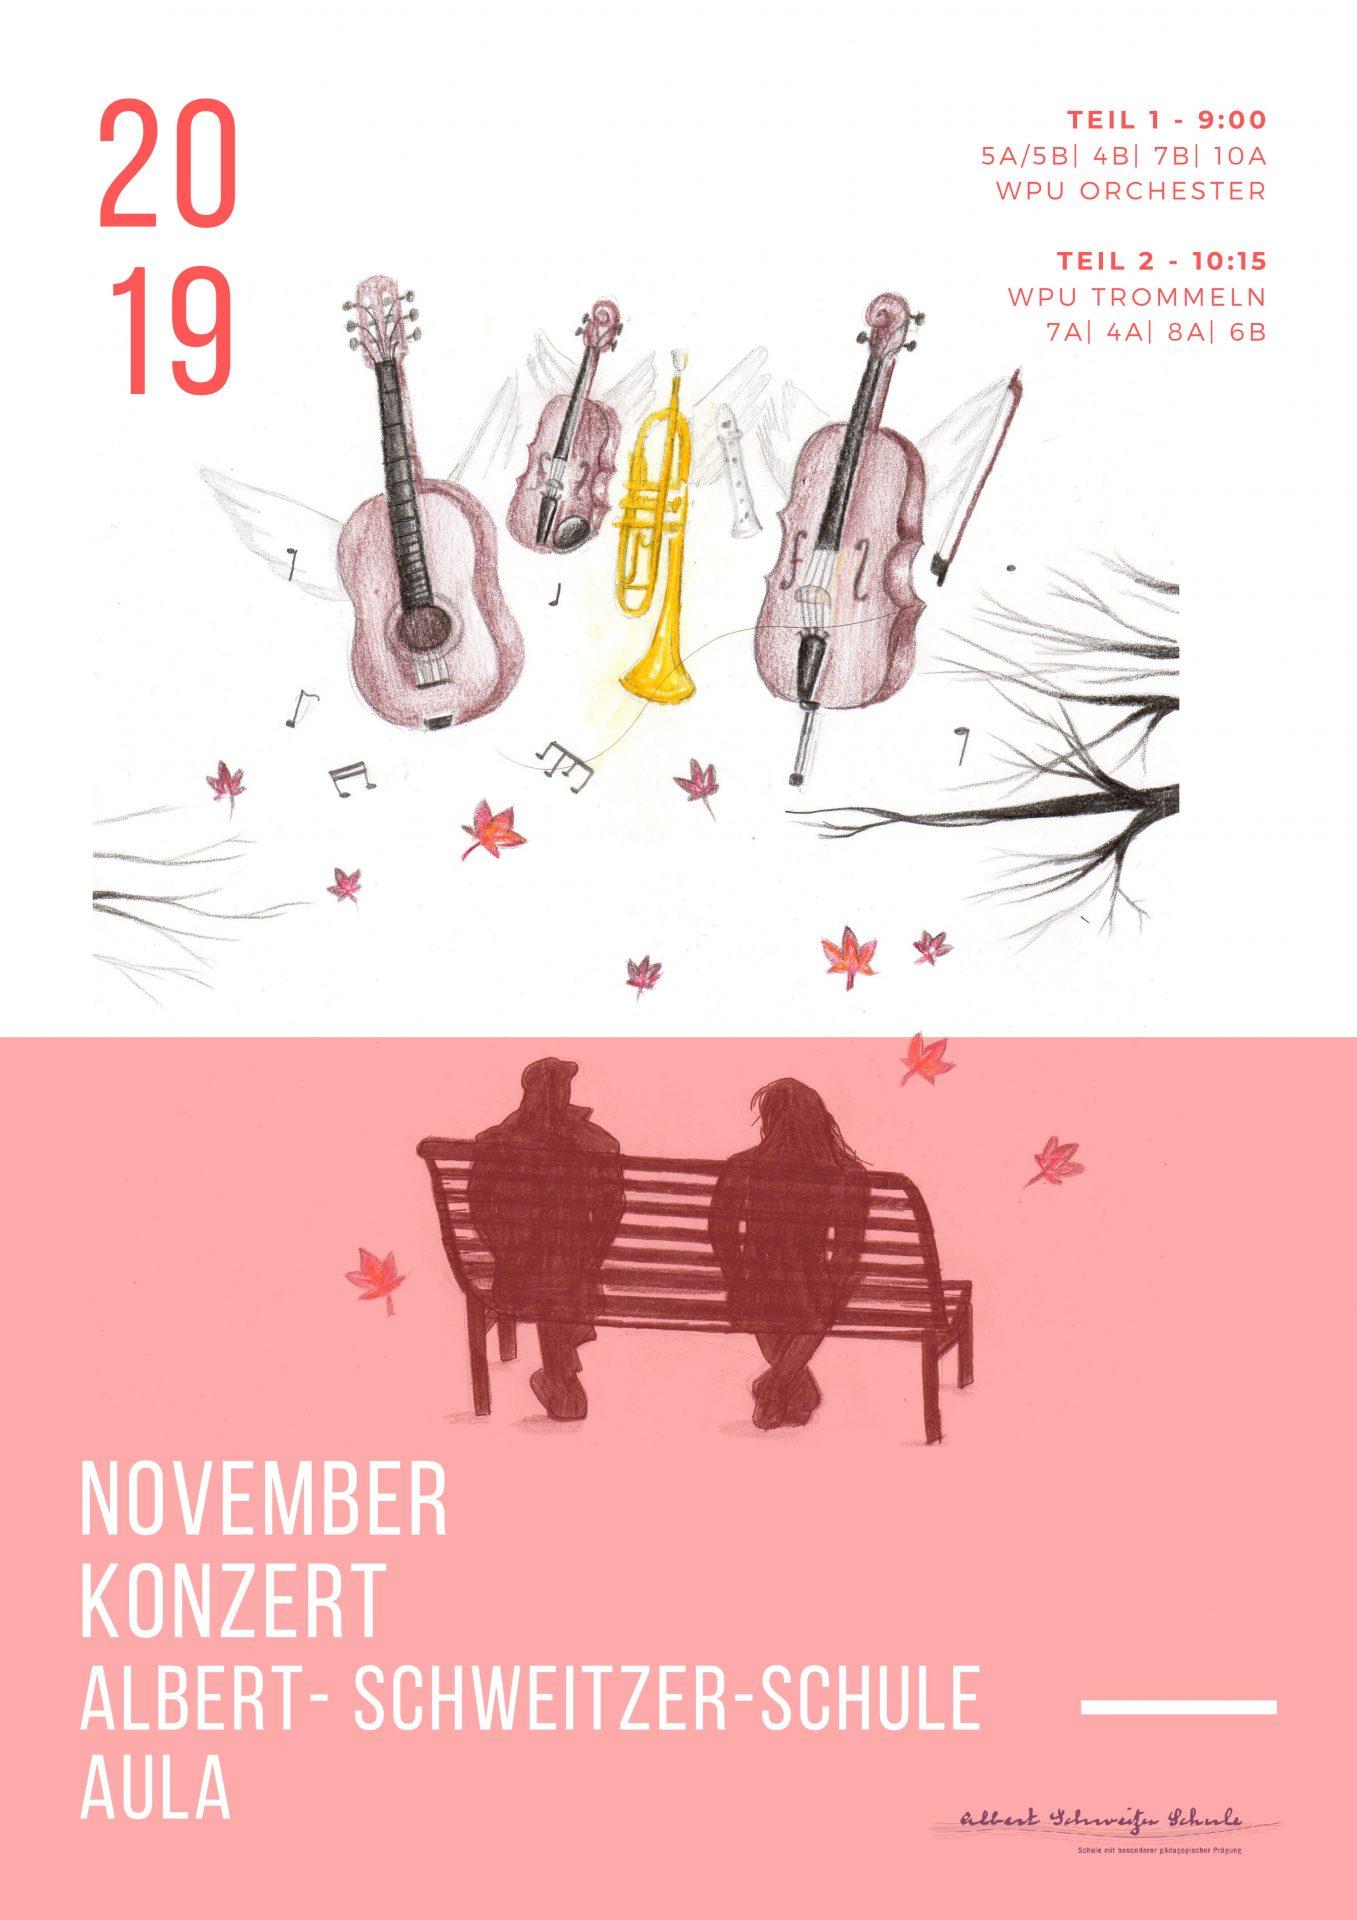 23.11.2019 Novemberkonzert